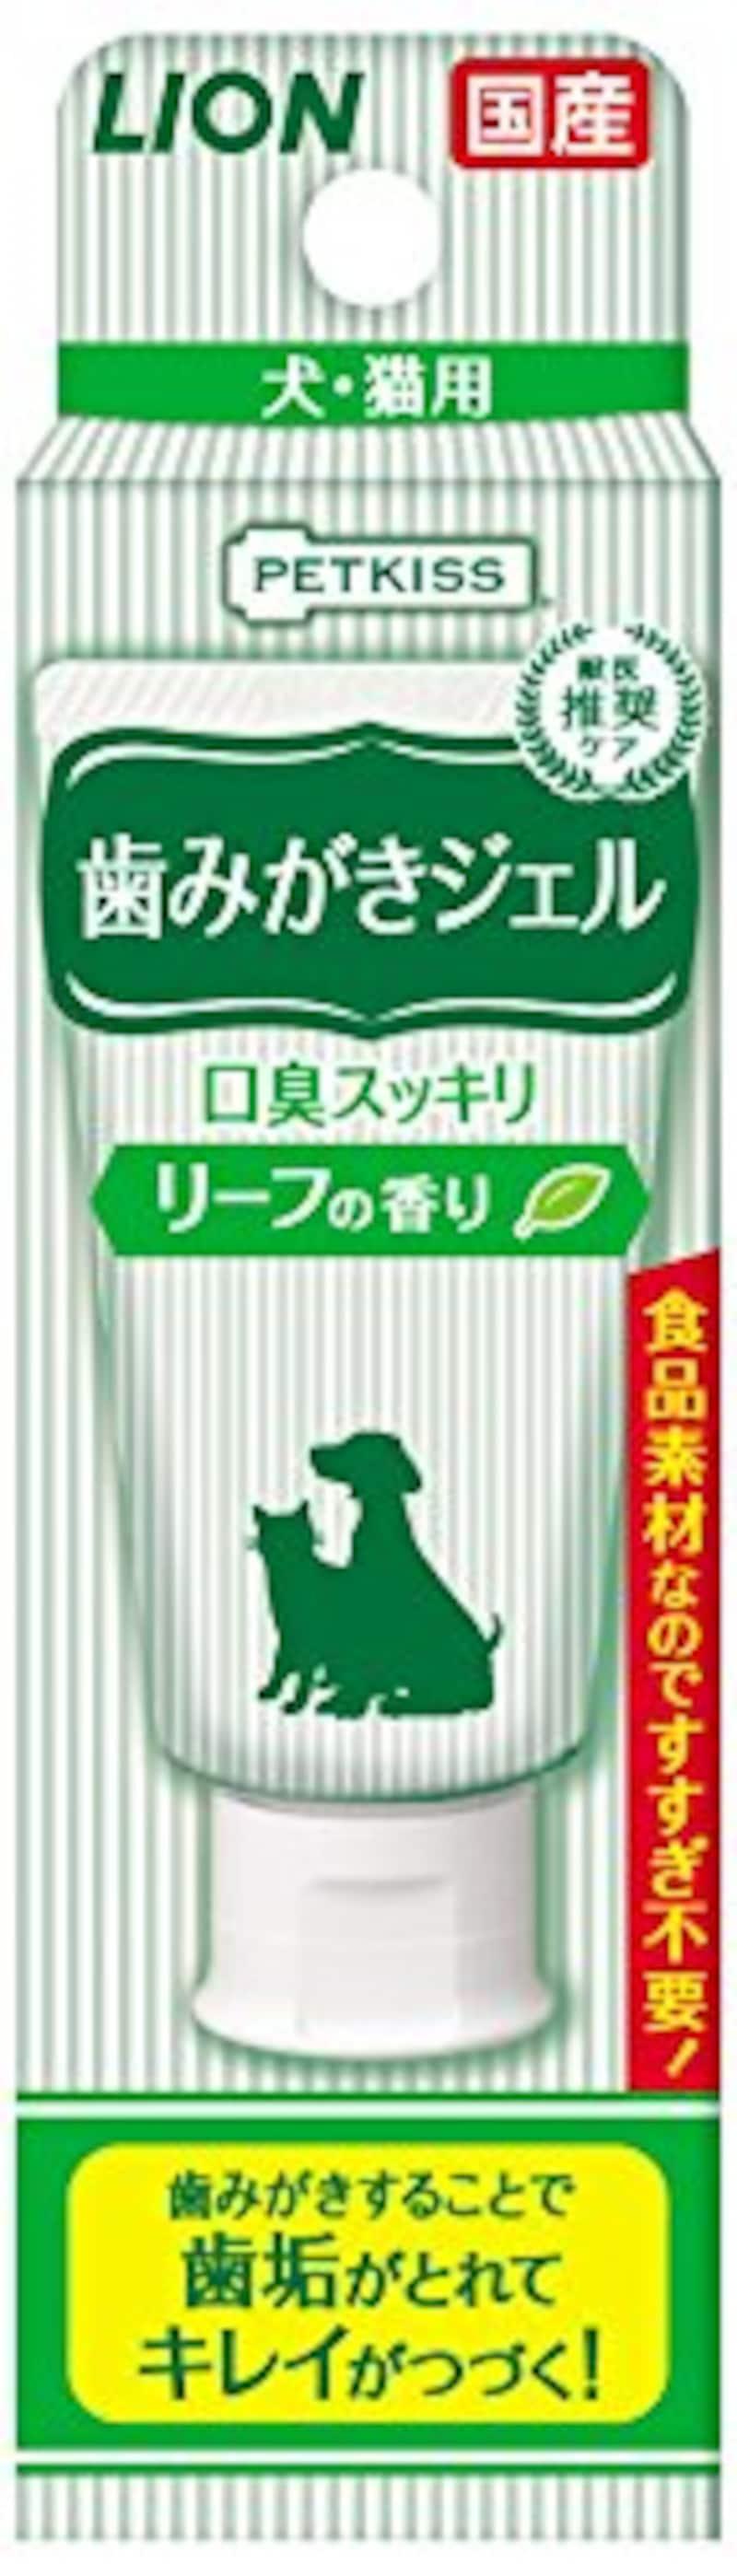 LION(ライオン),PETKISS 歯みがきジェル リーフの香り,500876